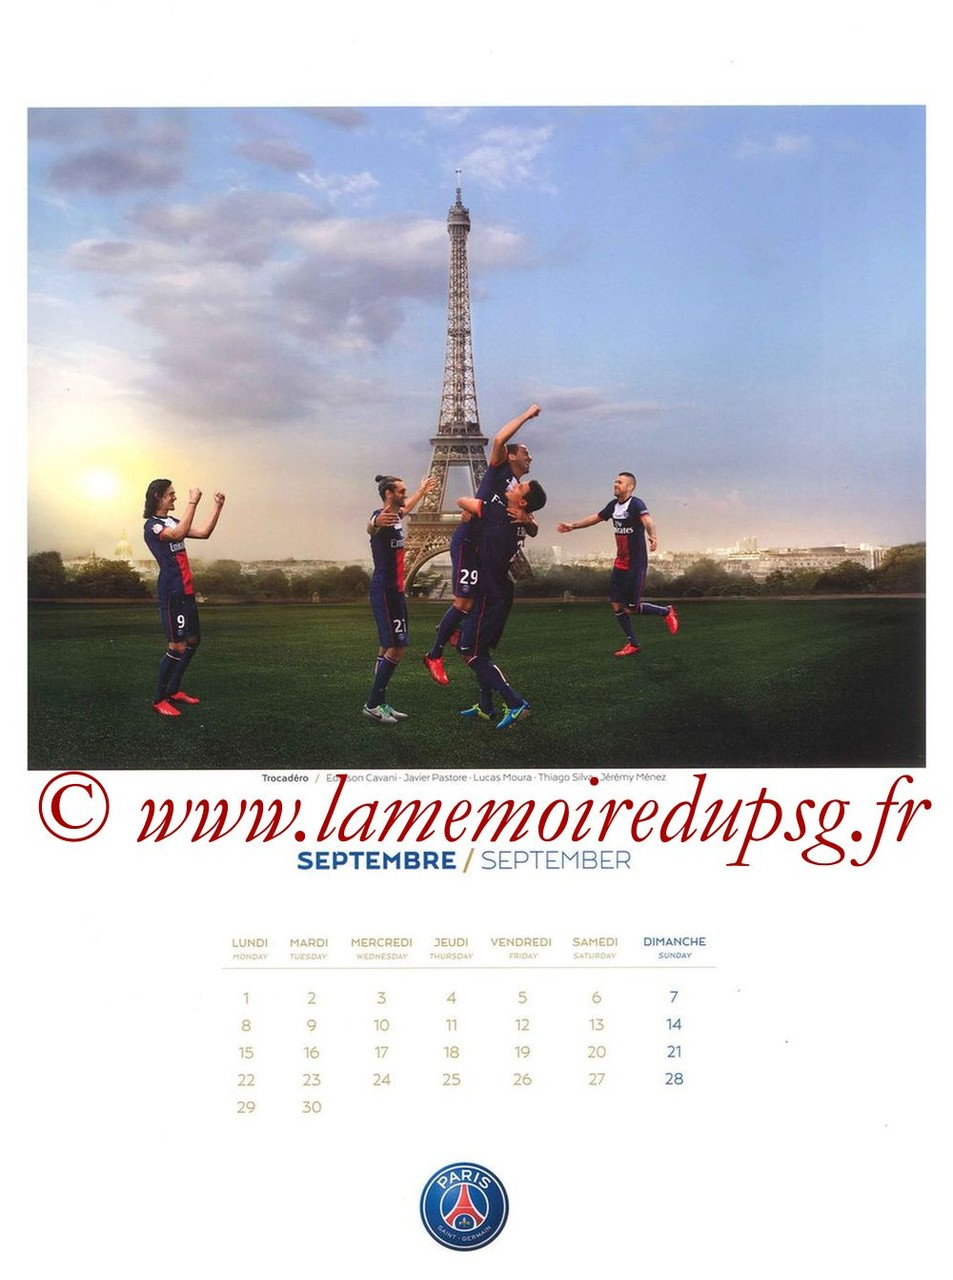 Calendrier PSG 2014 - Page 09 - Trocadéro